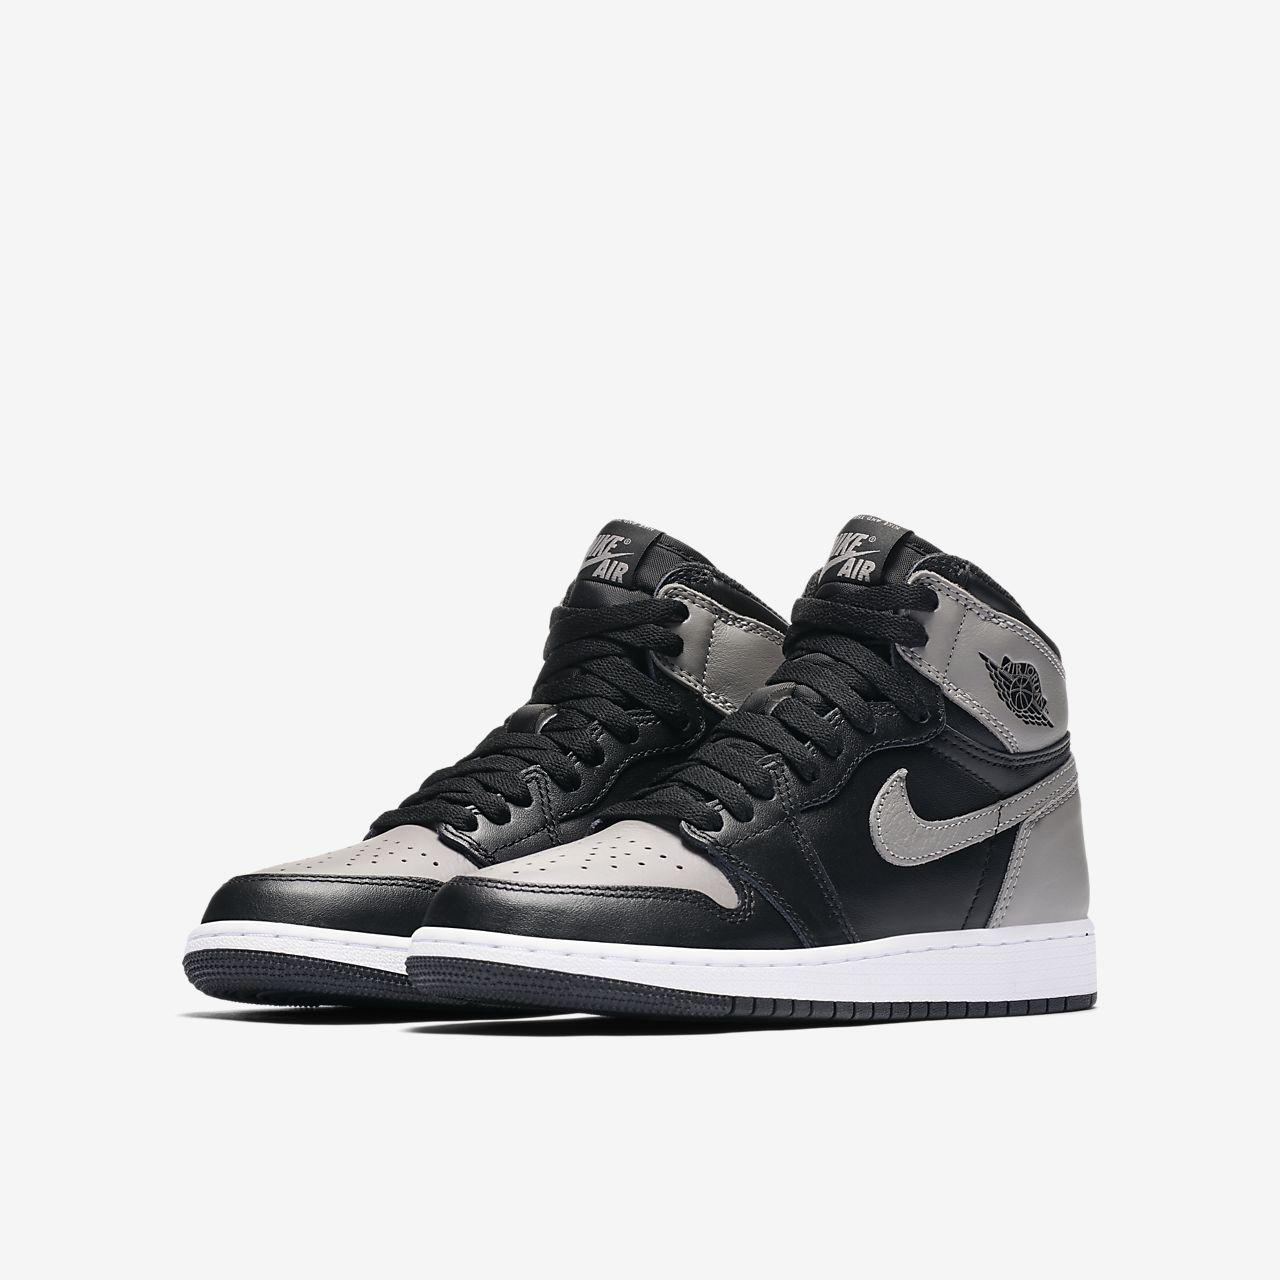 Big Kids Nike Air Jordans Musee Des Impressionnismes Giverny